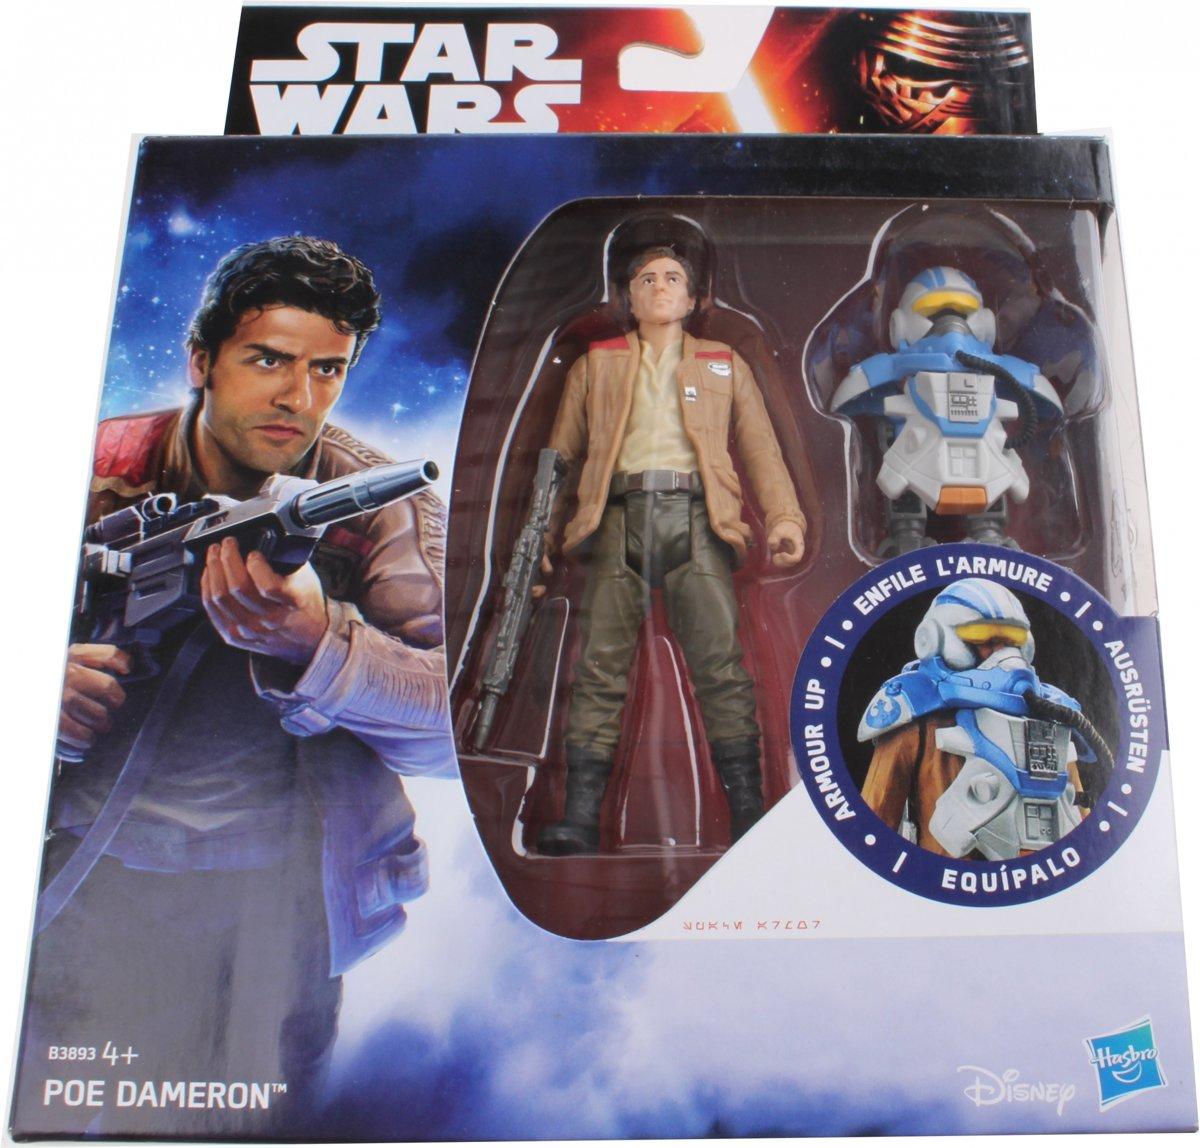 Action figure Star Wars Pack 10 cm Poe Dameron